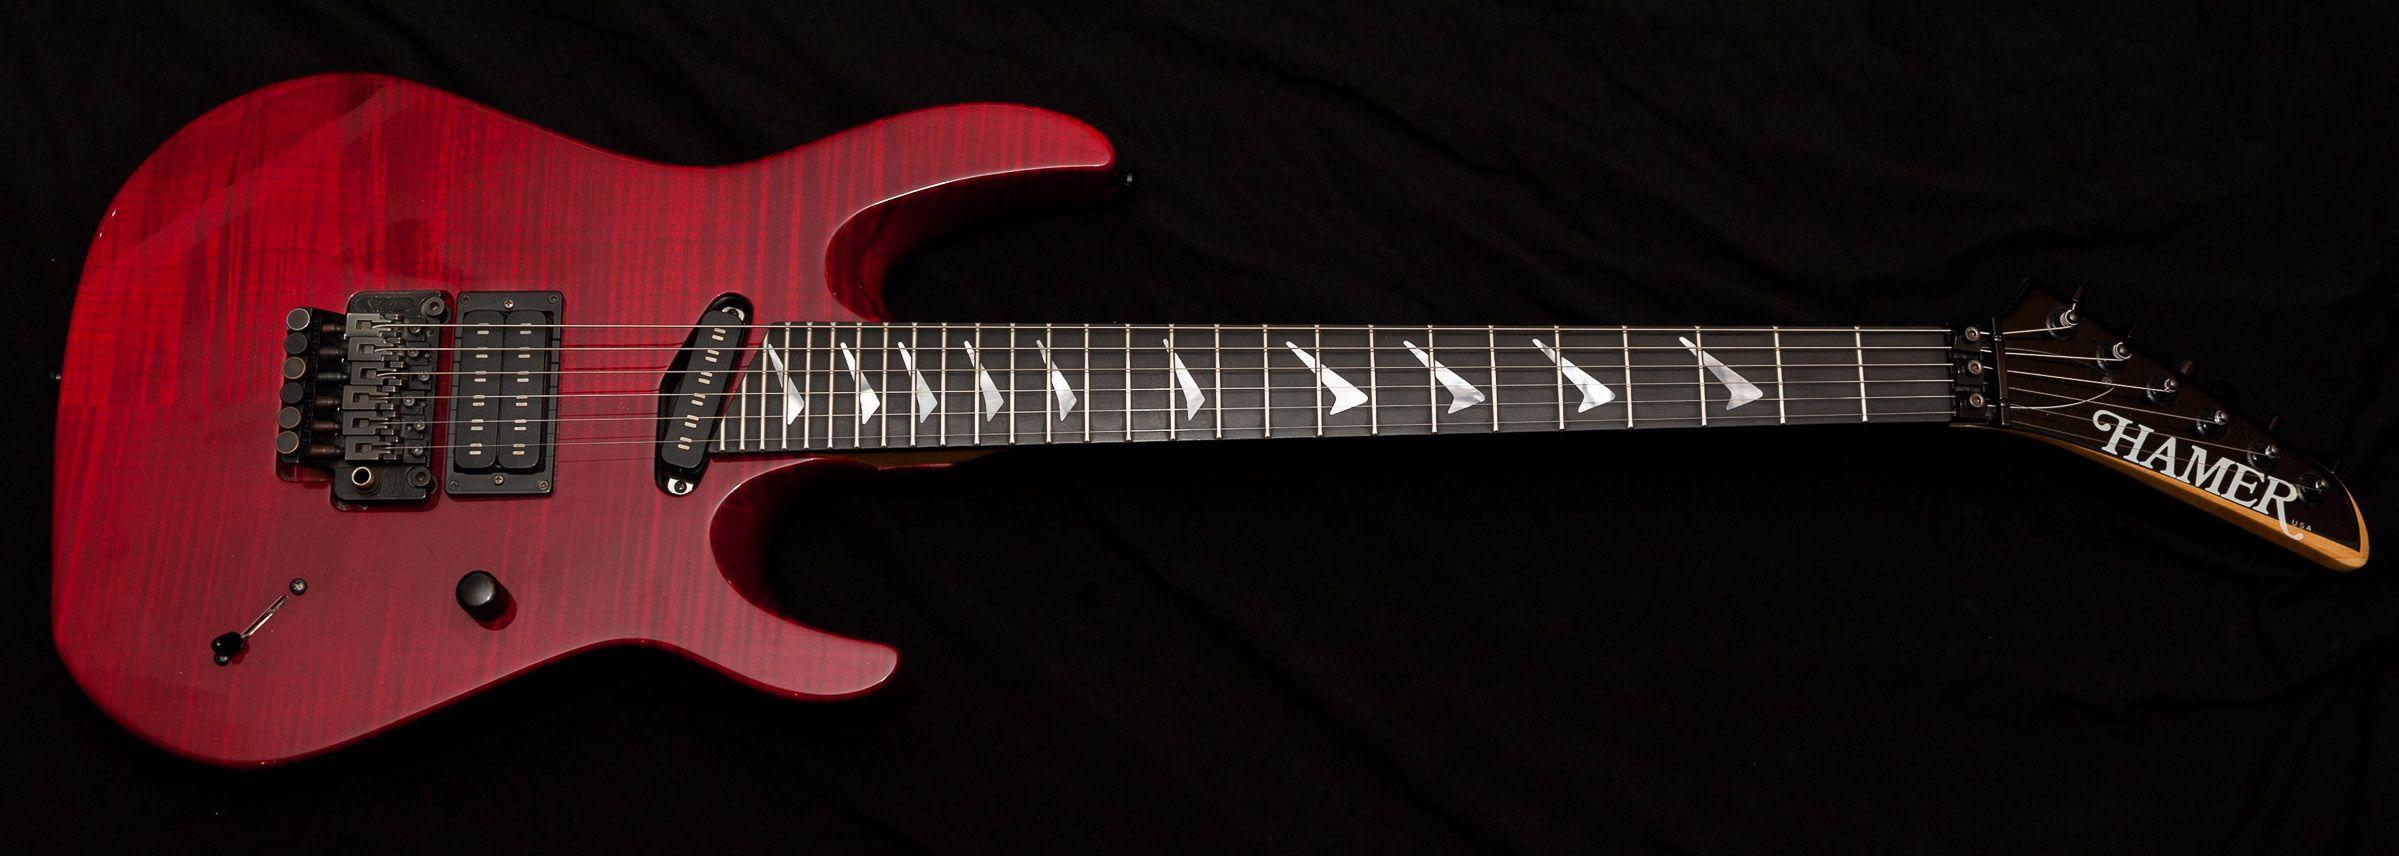 1990 hamer californian 27 frets shred guitars guitar playing guitar music. Black Bedroom Furniture Sets. Home Design Ideas